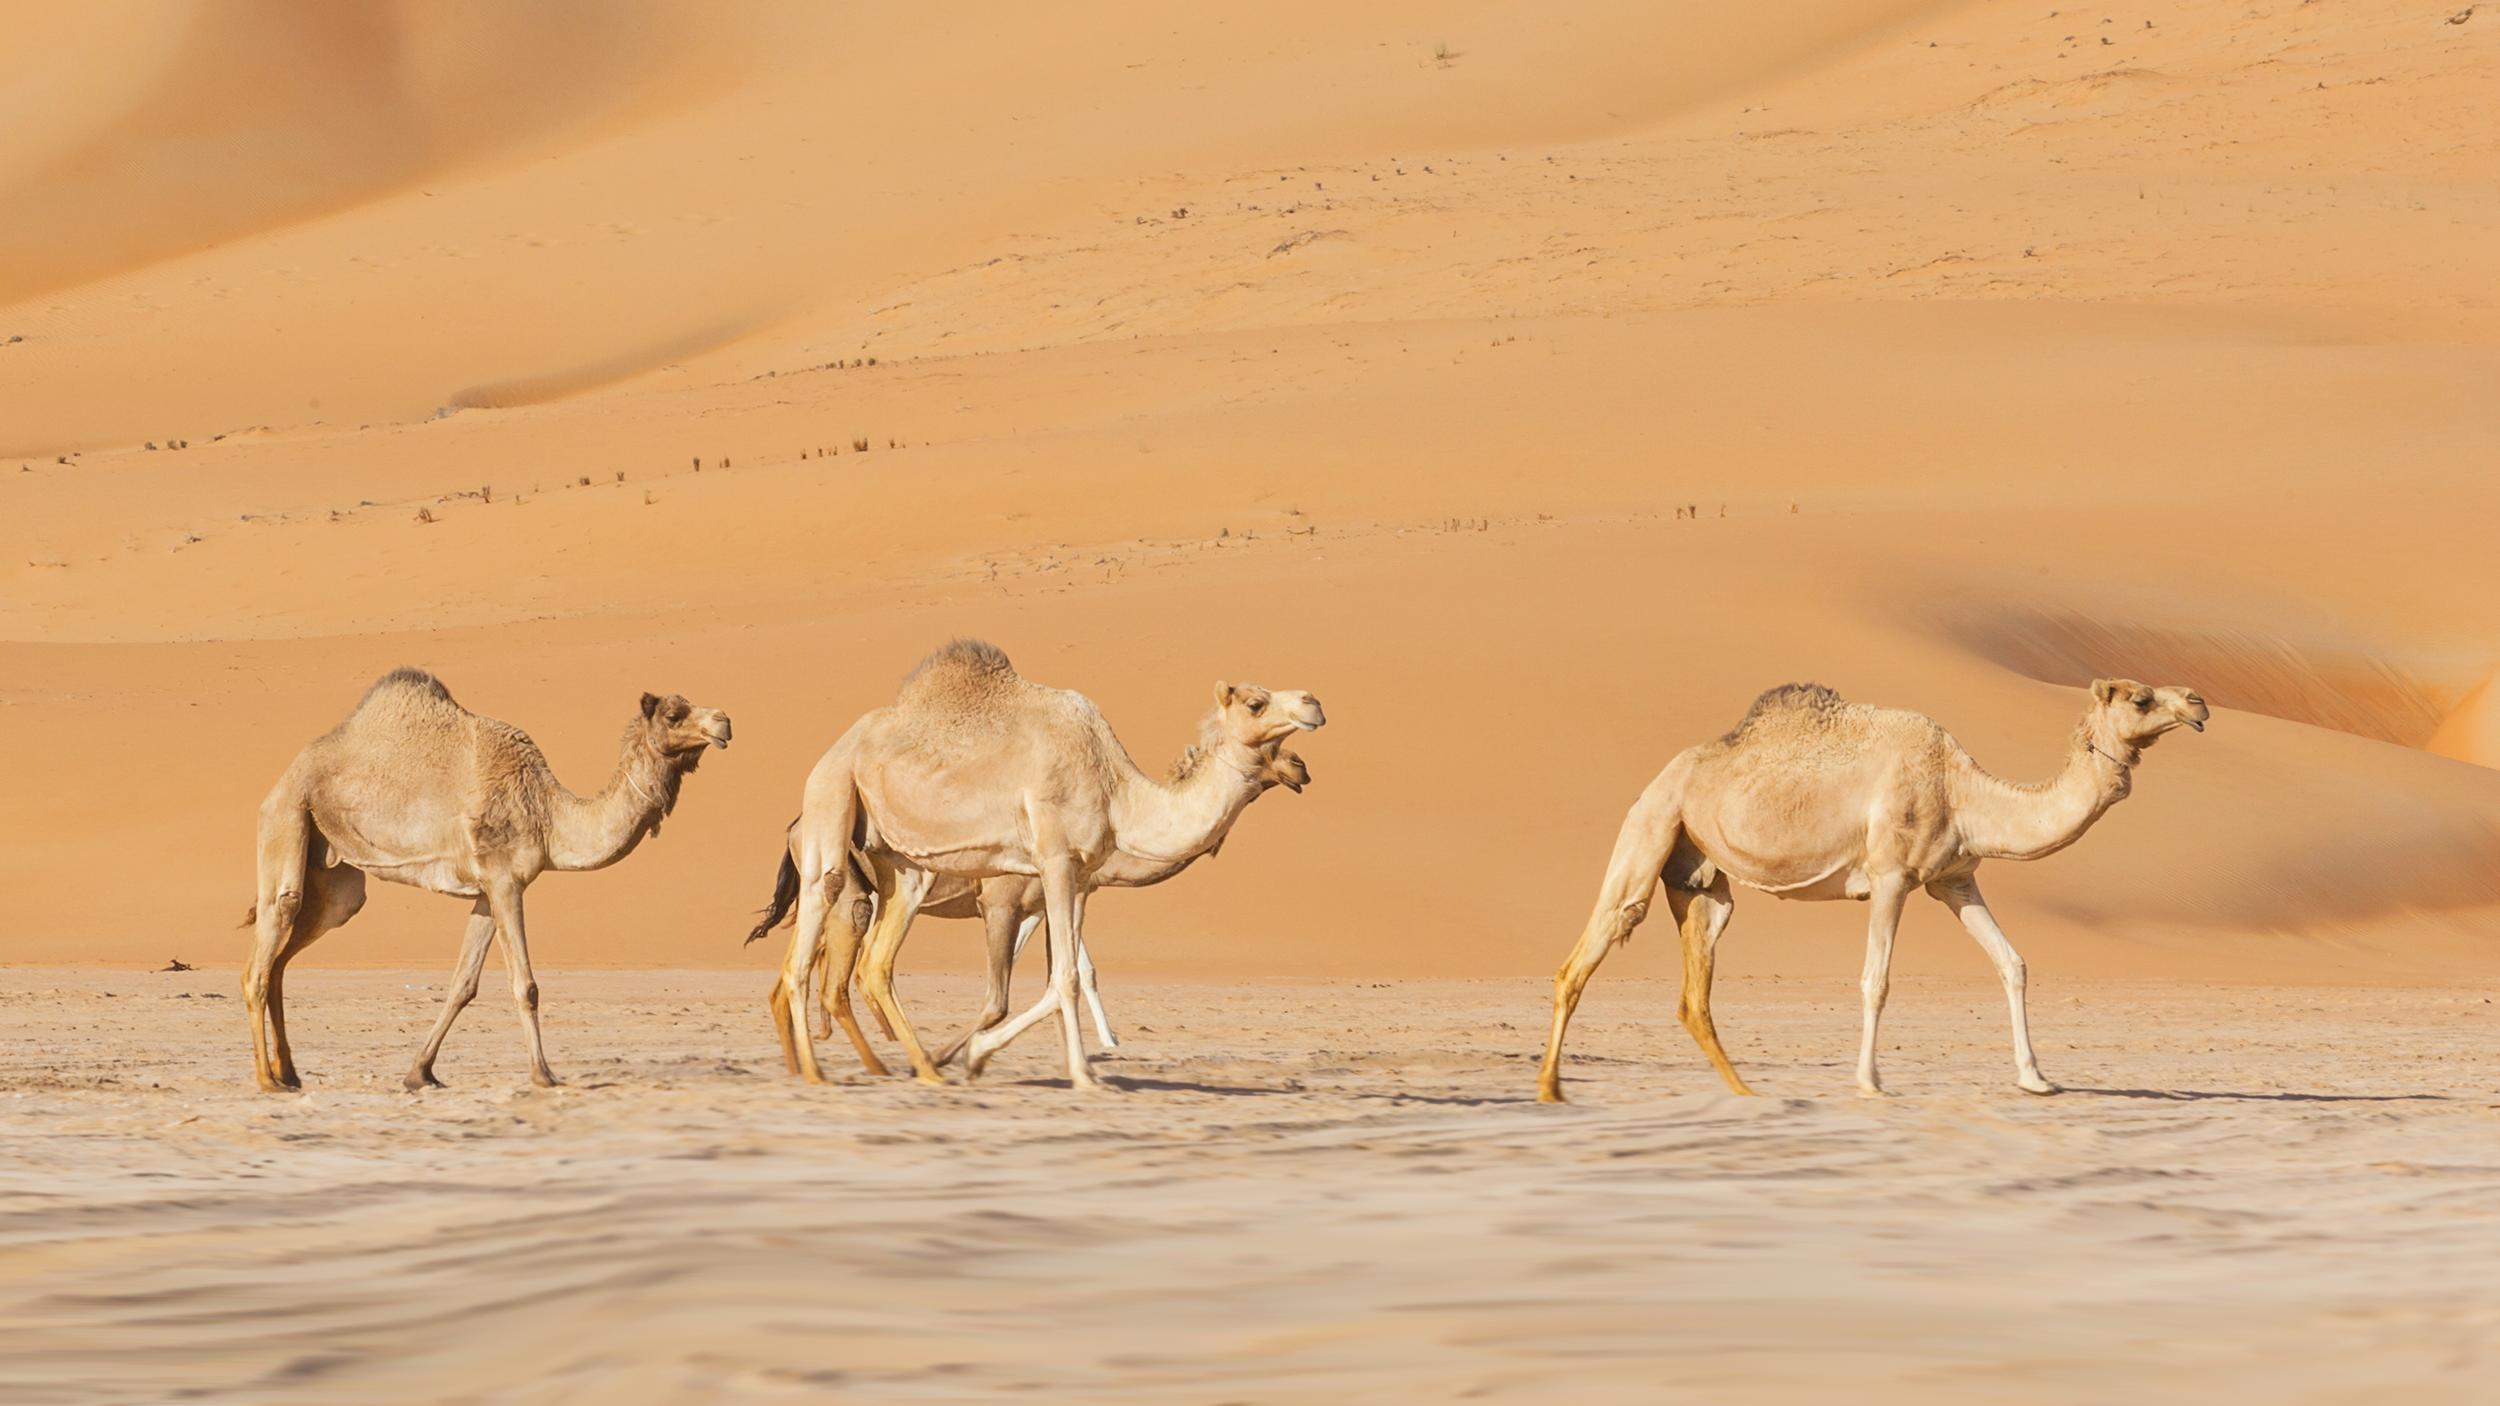 Destination: Dubai and Abu Dhabi